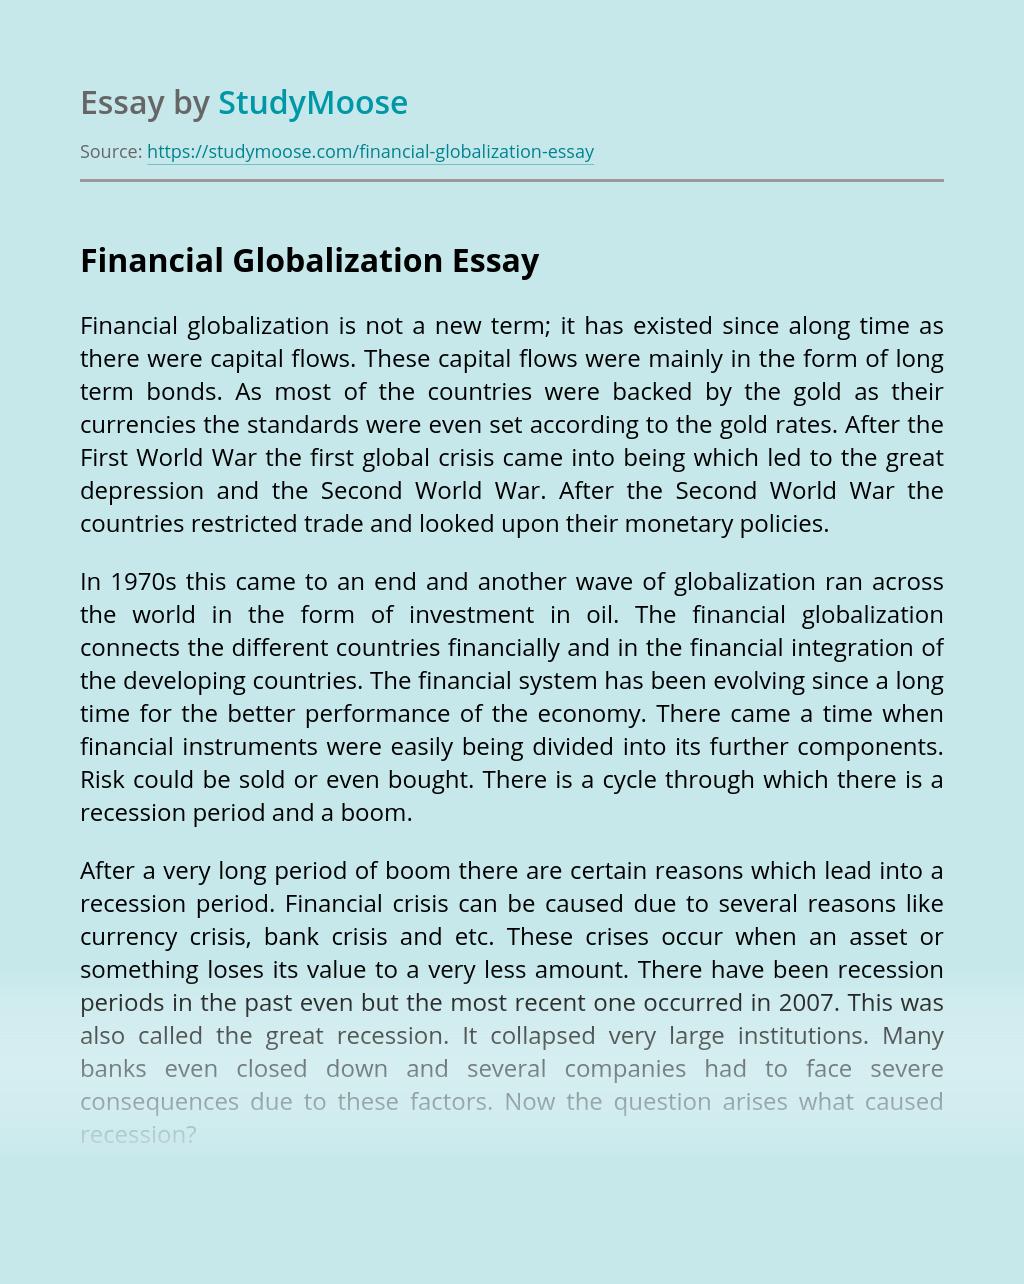 Financial Globalization